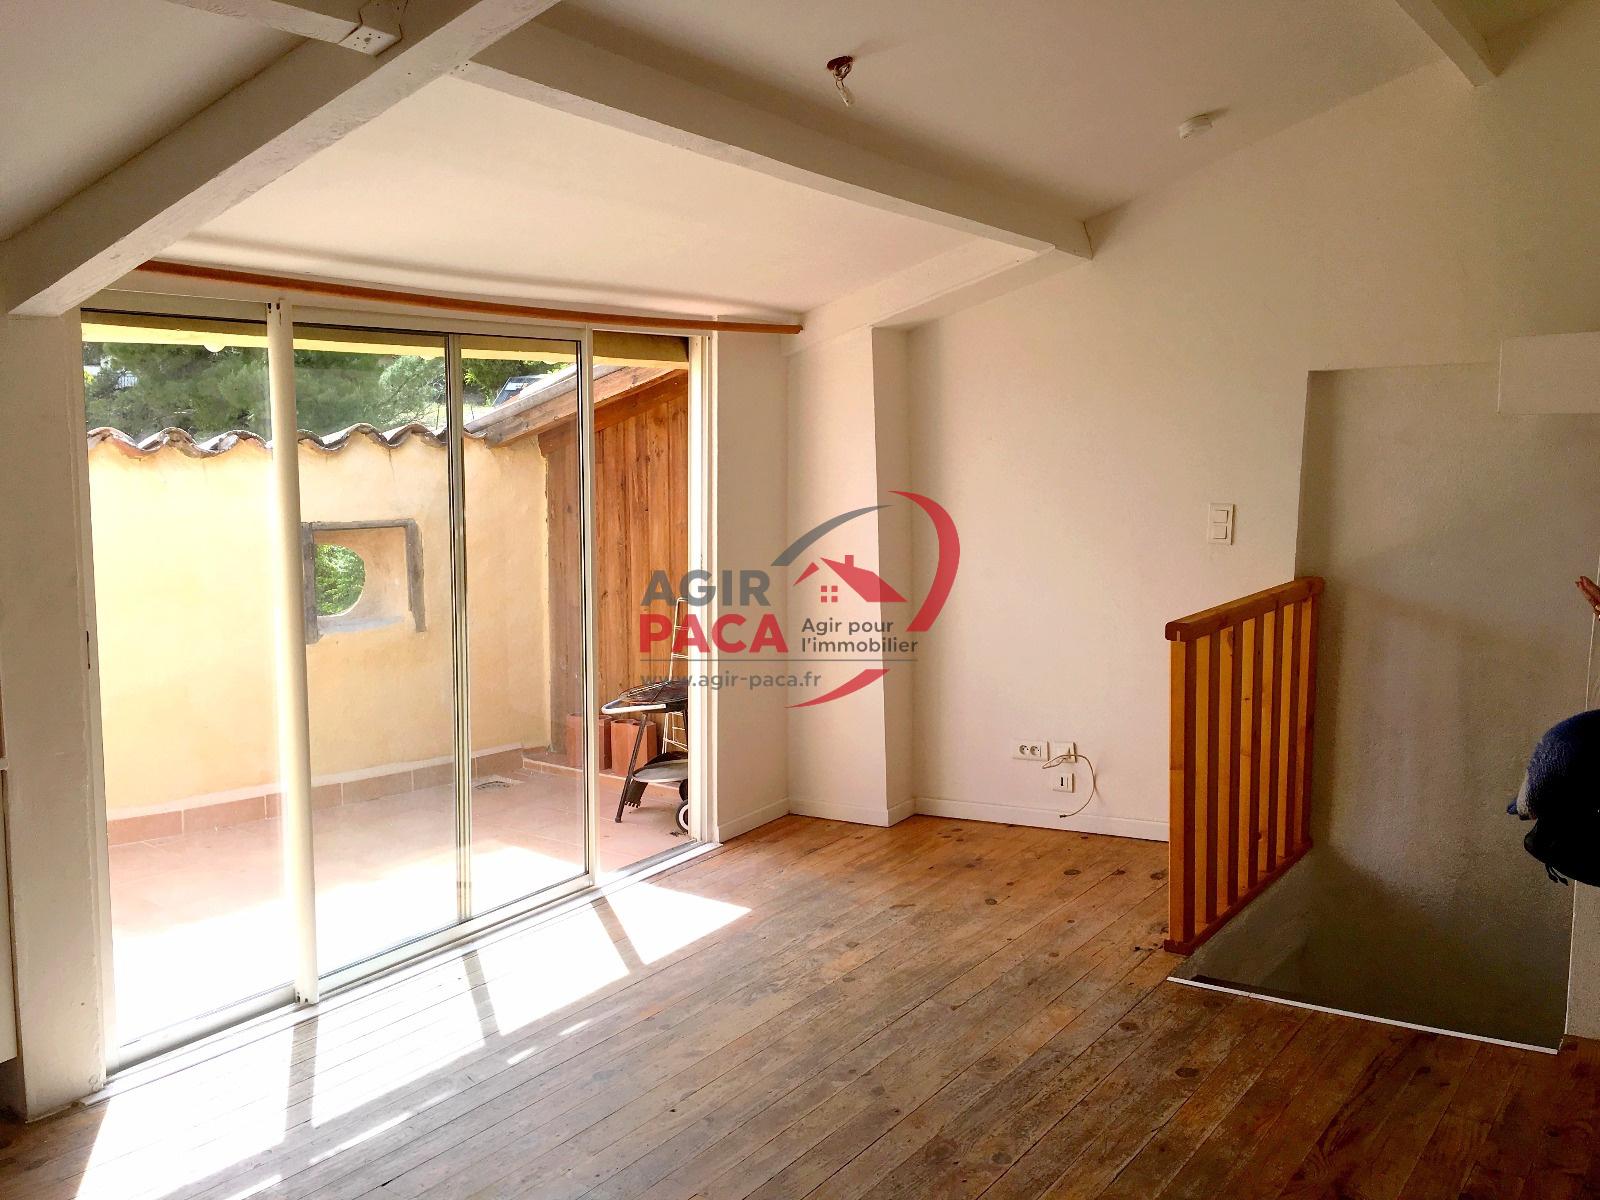 location appartement t3 de charme terrasse petit budget. Black Bedroom Furniture Sets. Home Design Ideas